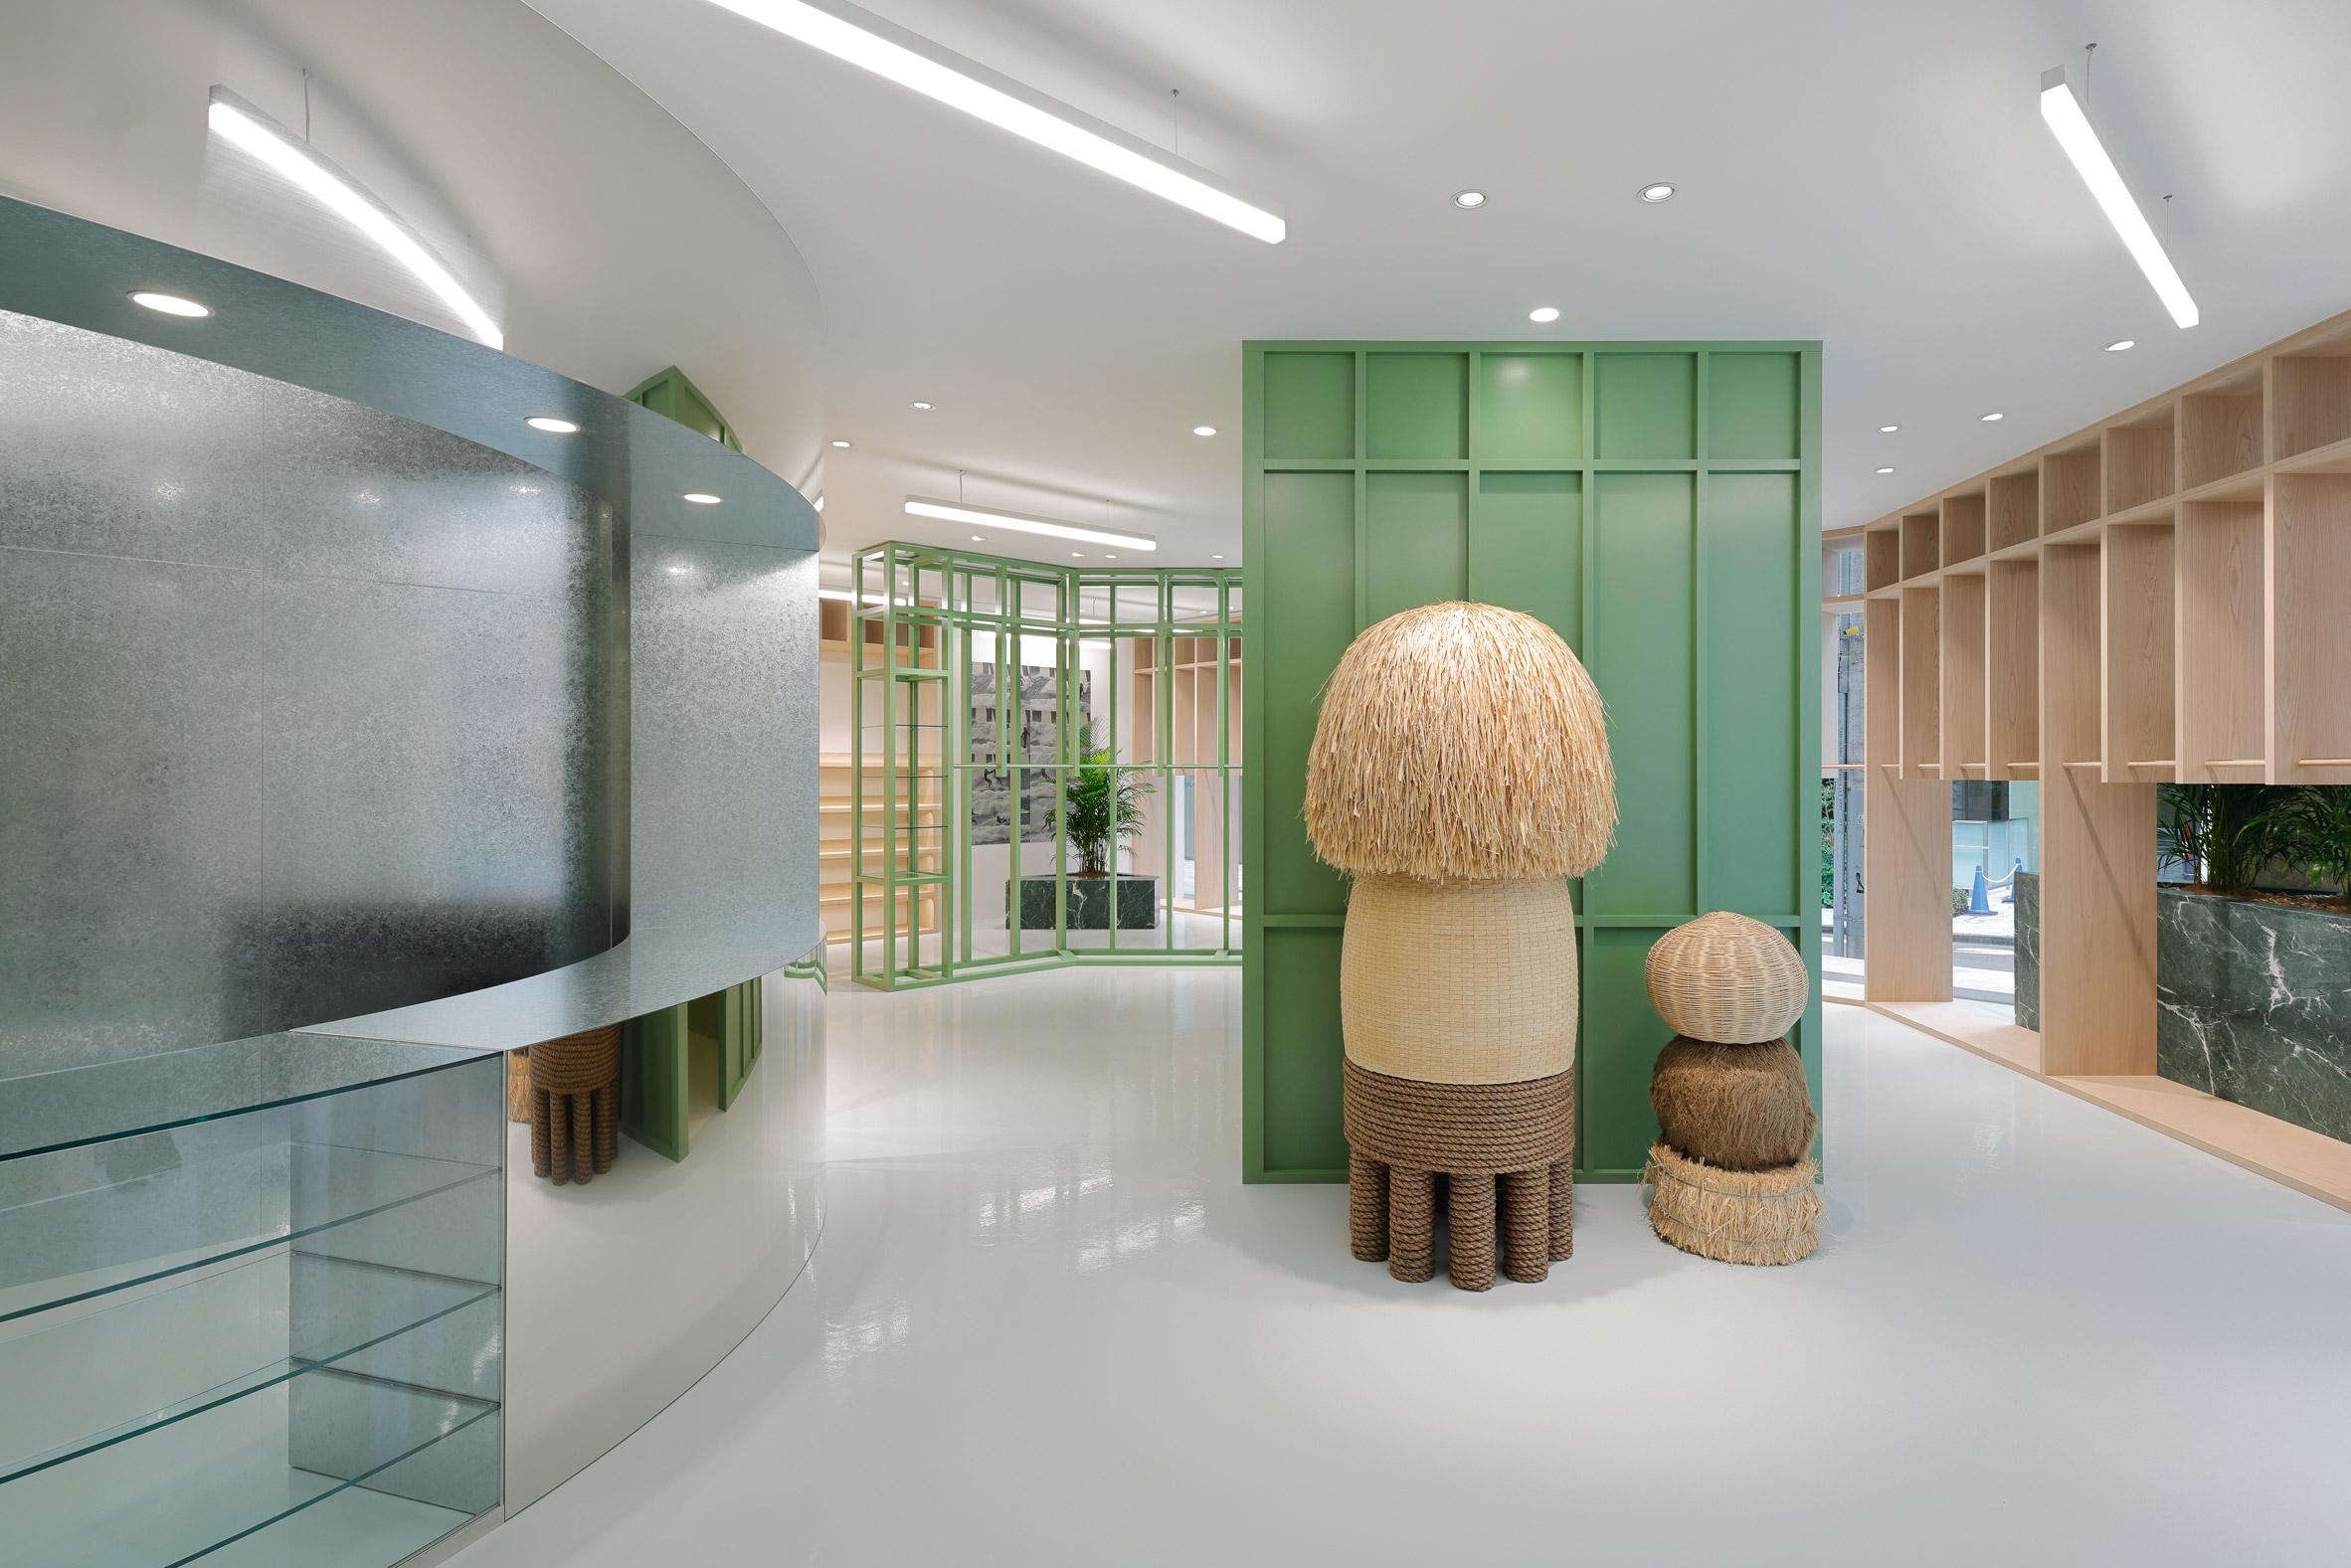 Mirrored counter, mushroom statues and green shelving in Stüssy Shibuya store